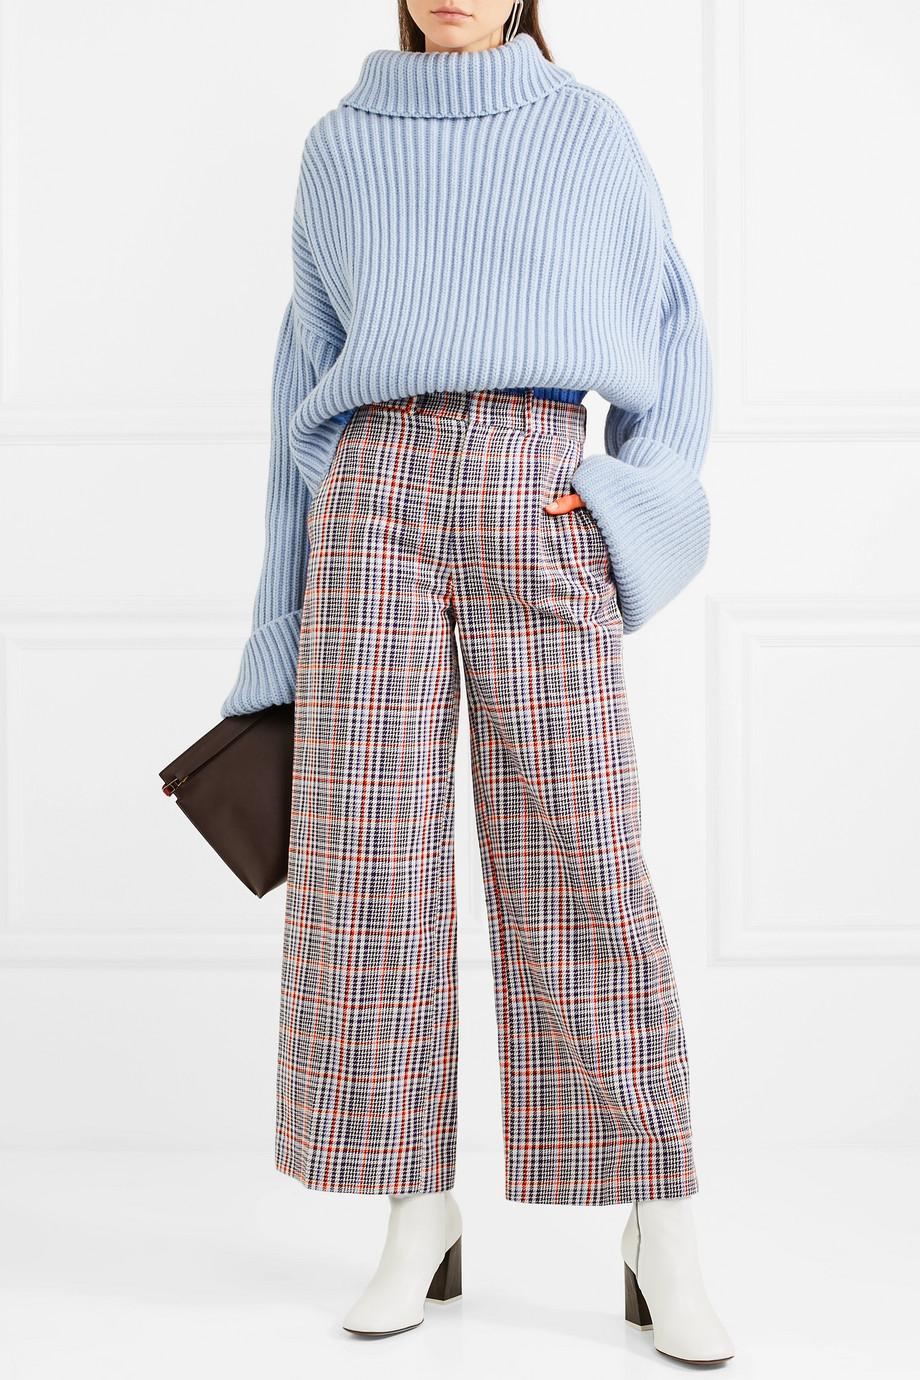 Joseph Ferrandi checked cotton-tweed wide-leg pants $222.50